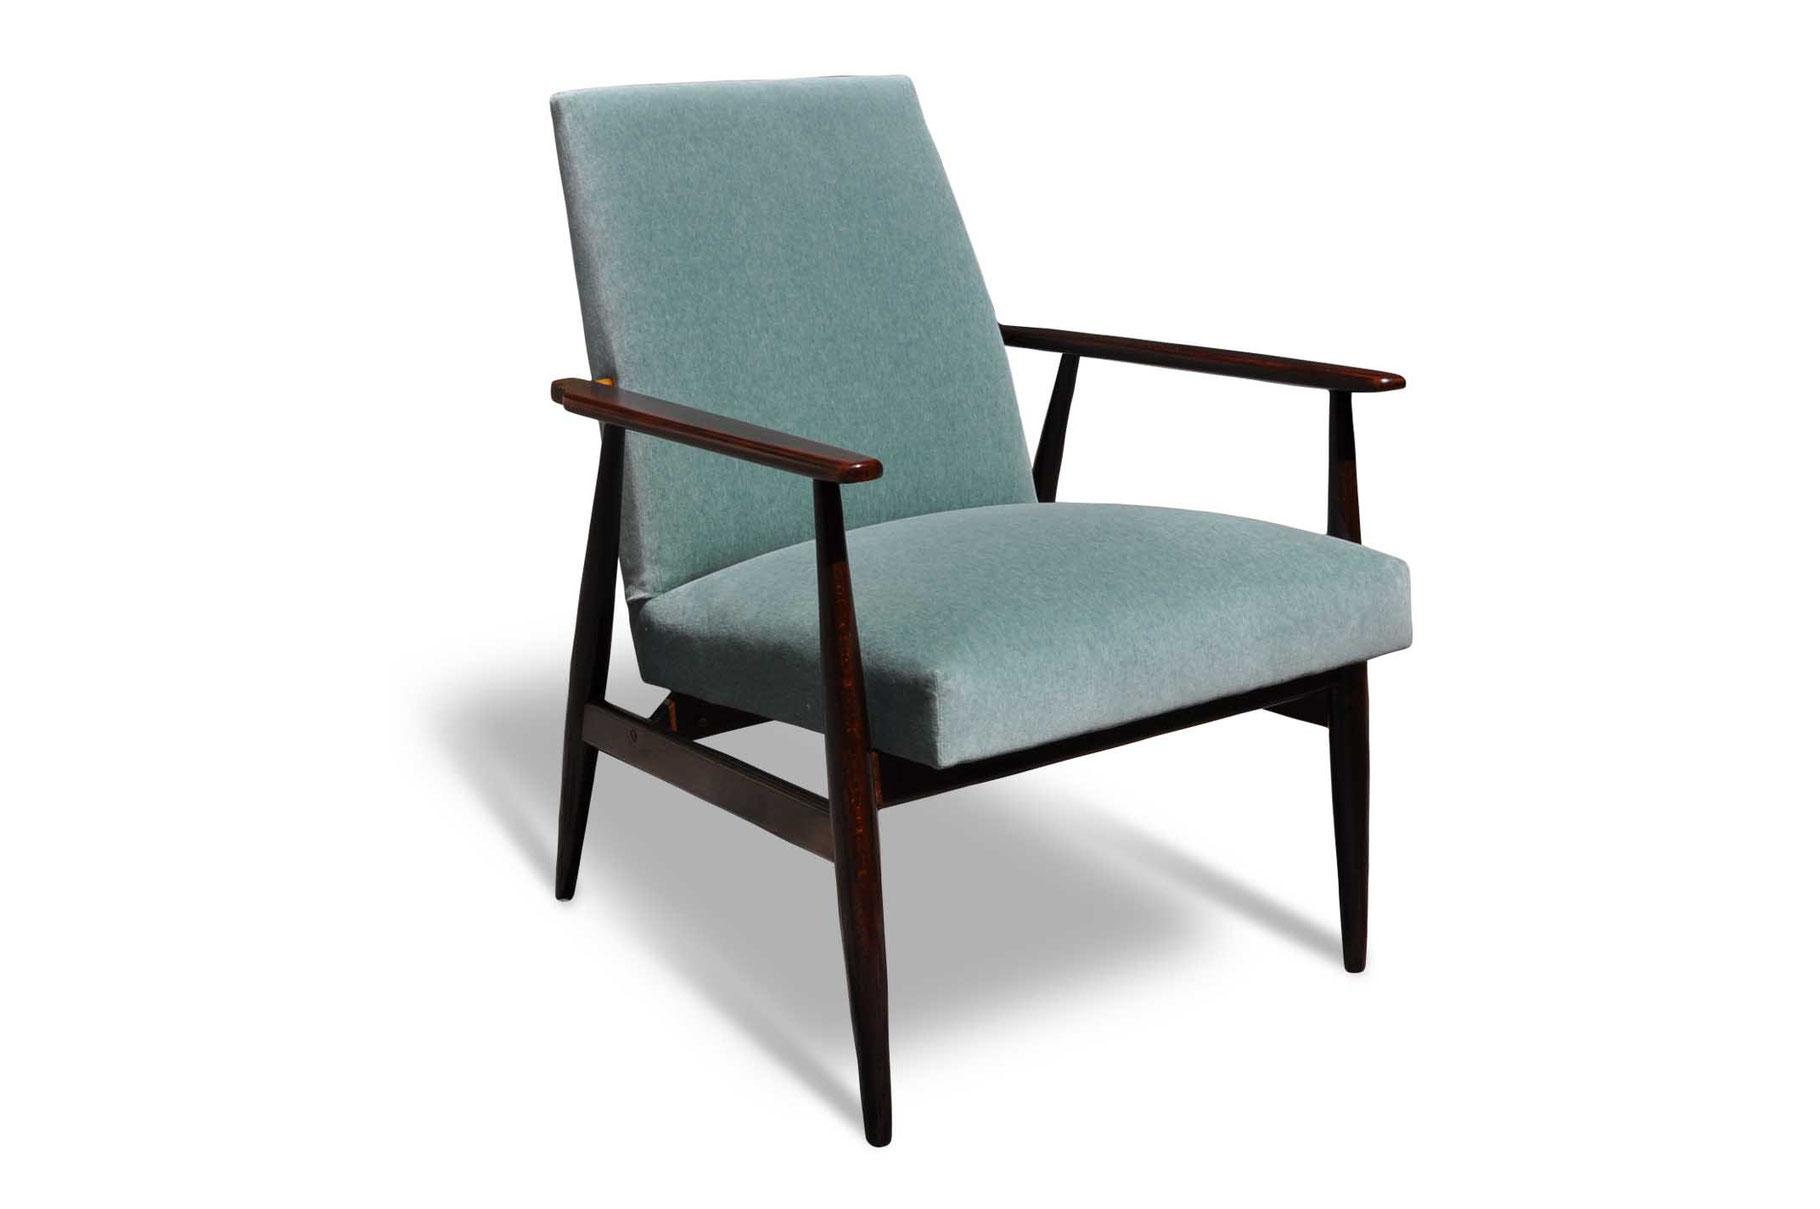 Poltrona anni \'50 stile scandinavo - Italian Vintage Sofa